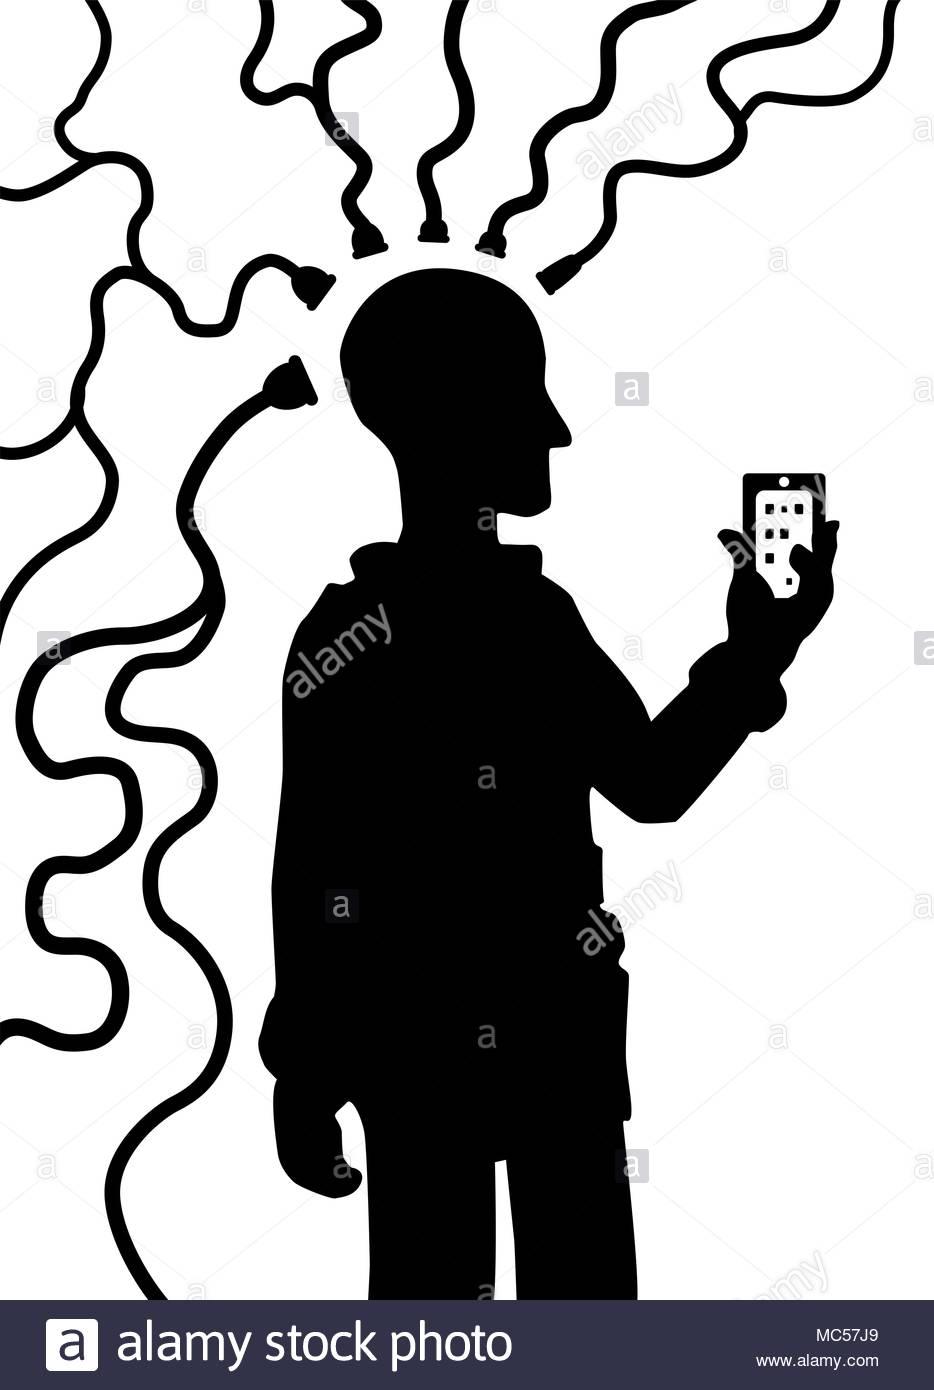 934x1390 Person Silhouette Identity Stock Photos Amp Person Silhouette